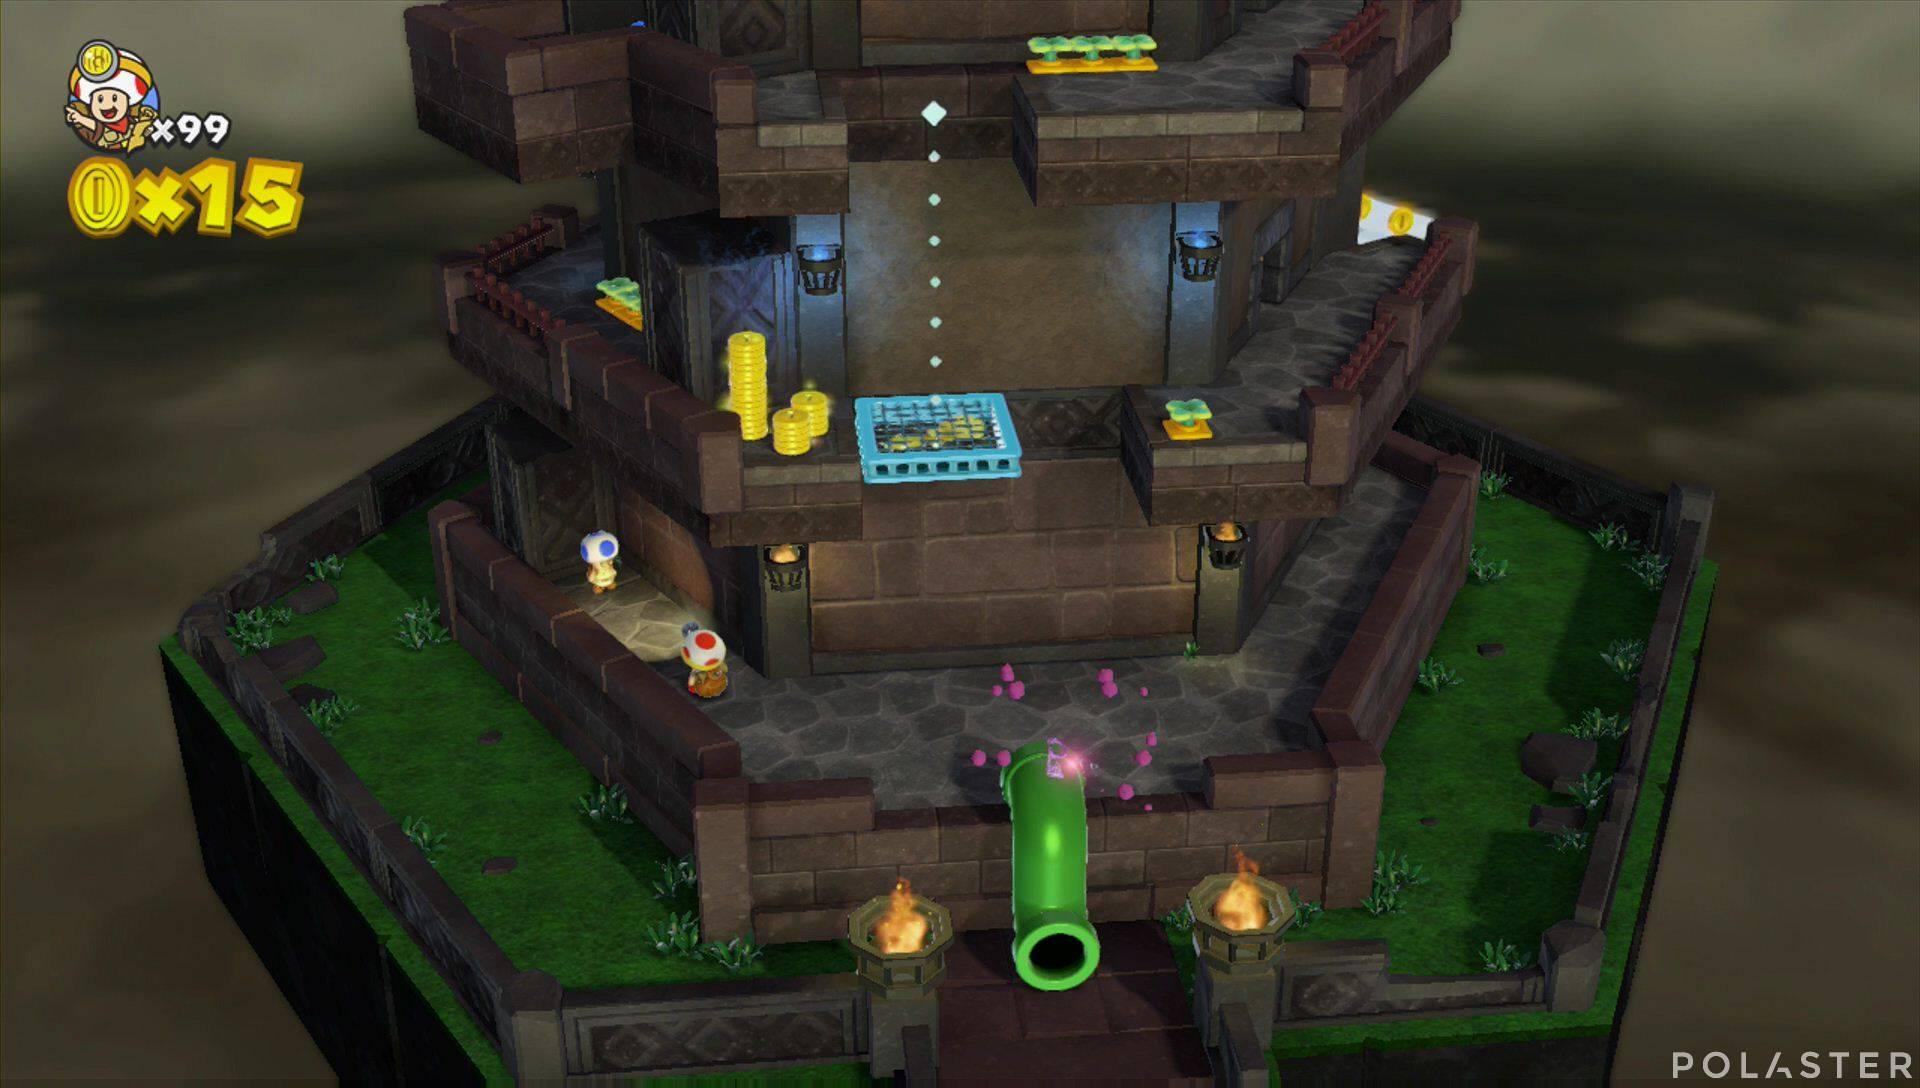 Captain Toad: Treasure Tracker Extra: ¡Cuadrilla, a la torre insólita! Toad azul